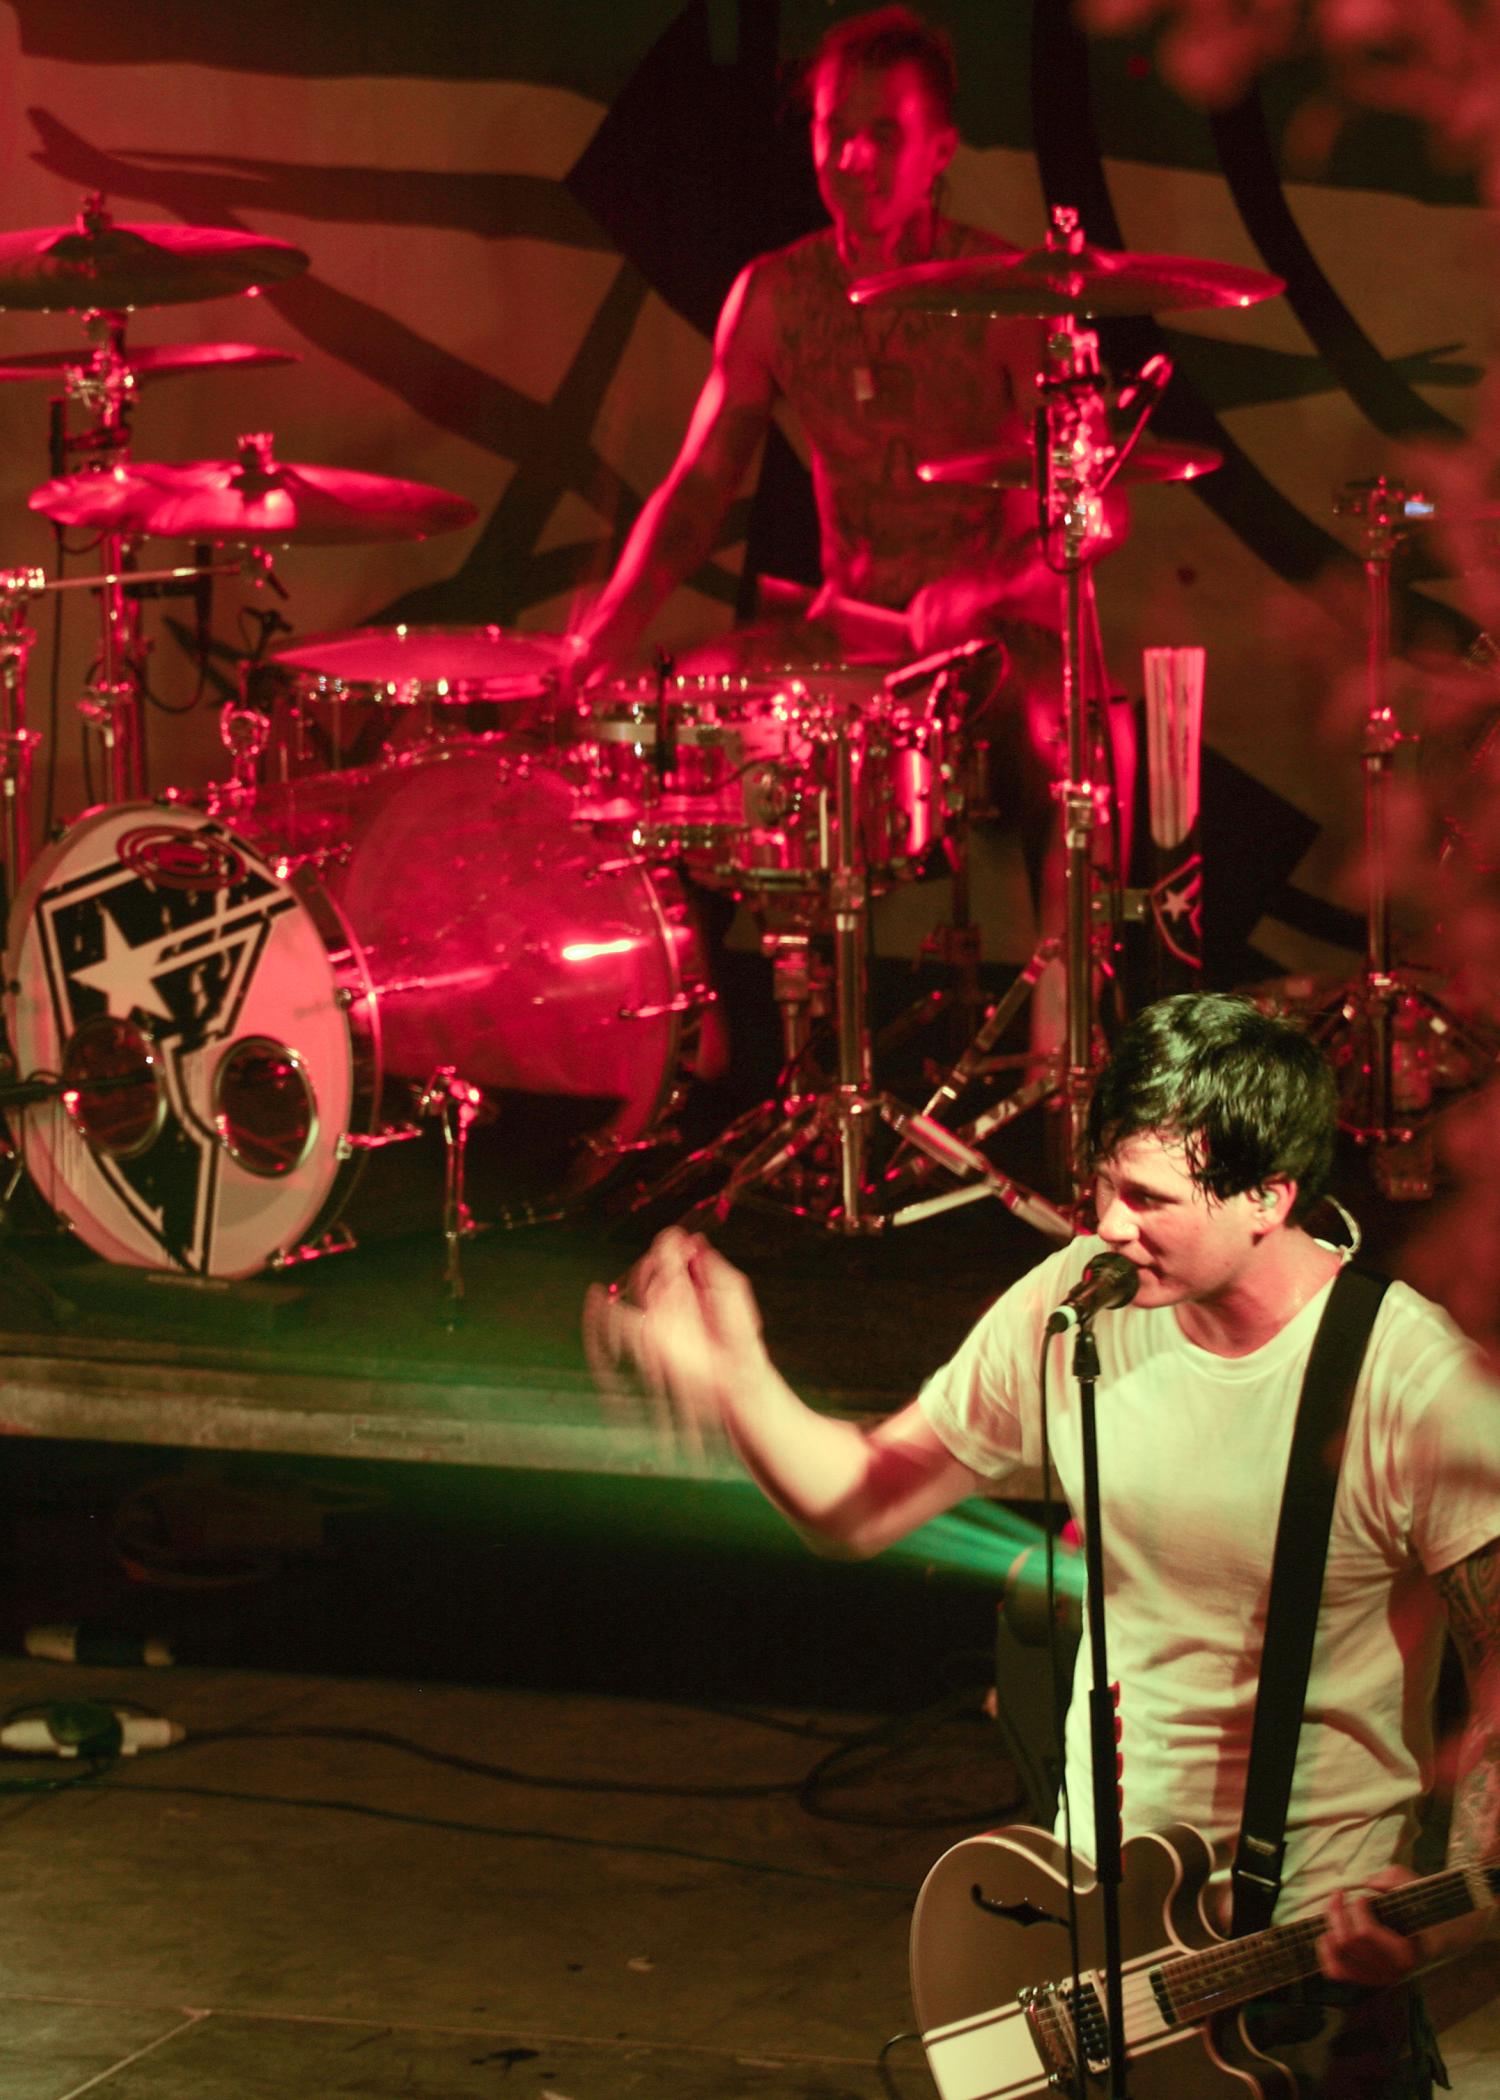 Lagu blink-182 - family reunion / mark hoppus drum-solo live @ reading 2014 mp3